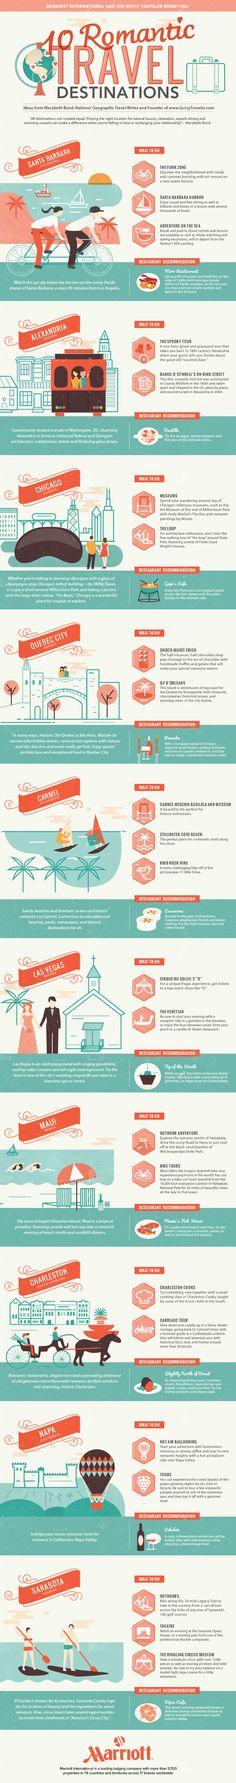 Pinning this because alexandria made the list. Ten Romantic Travel Destinations #Infographic #infografía